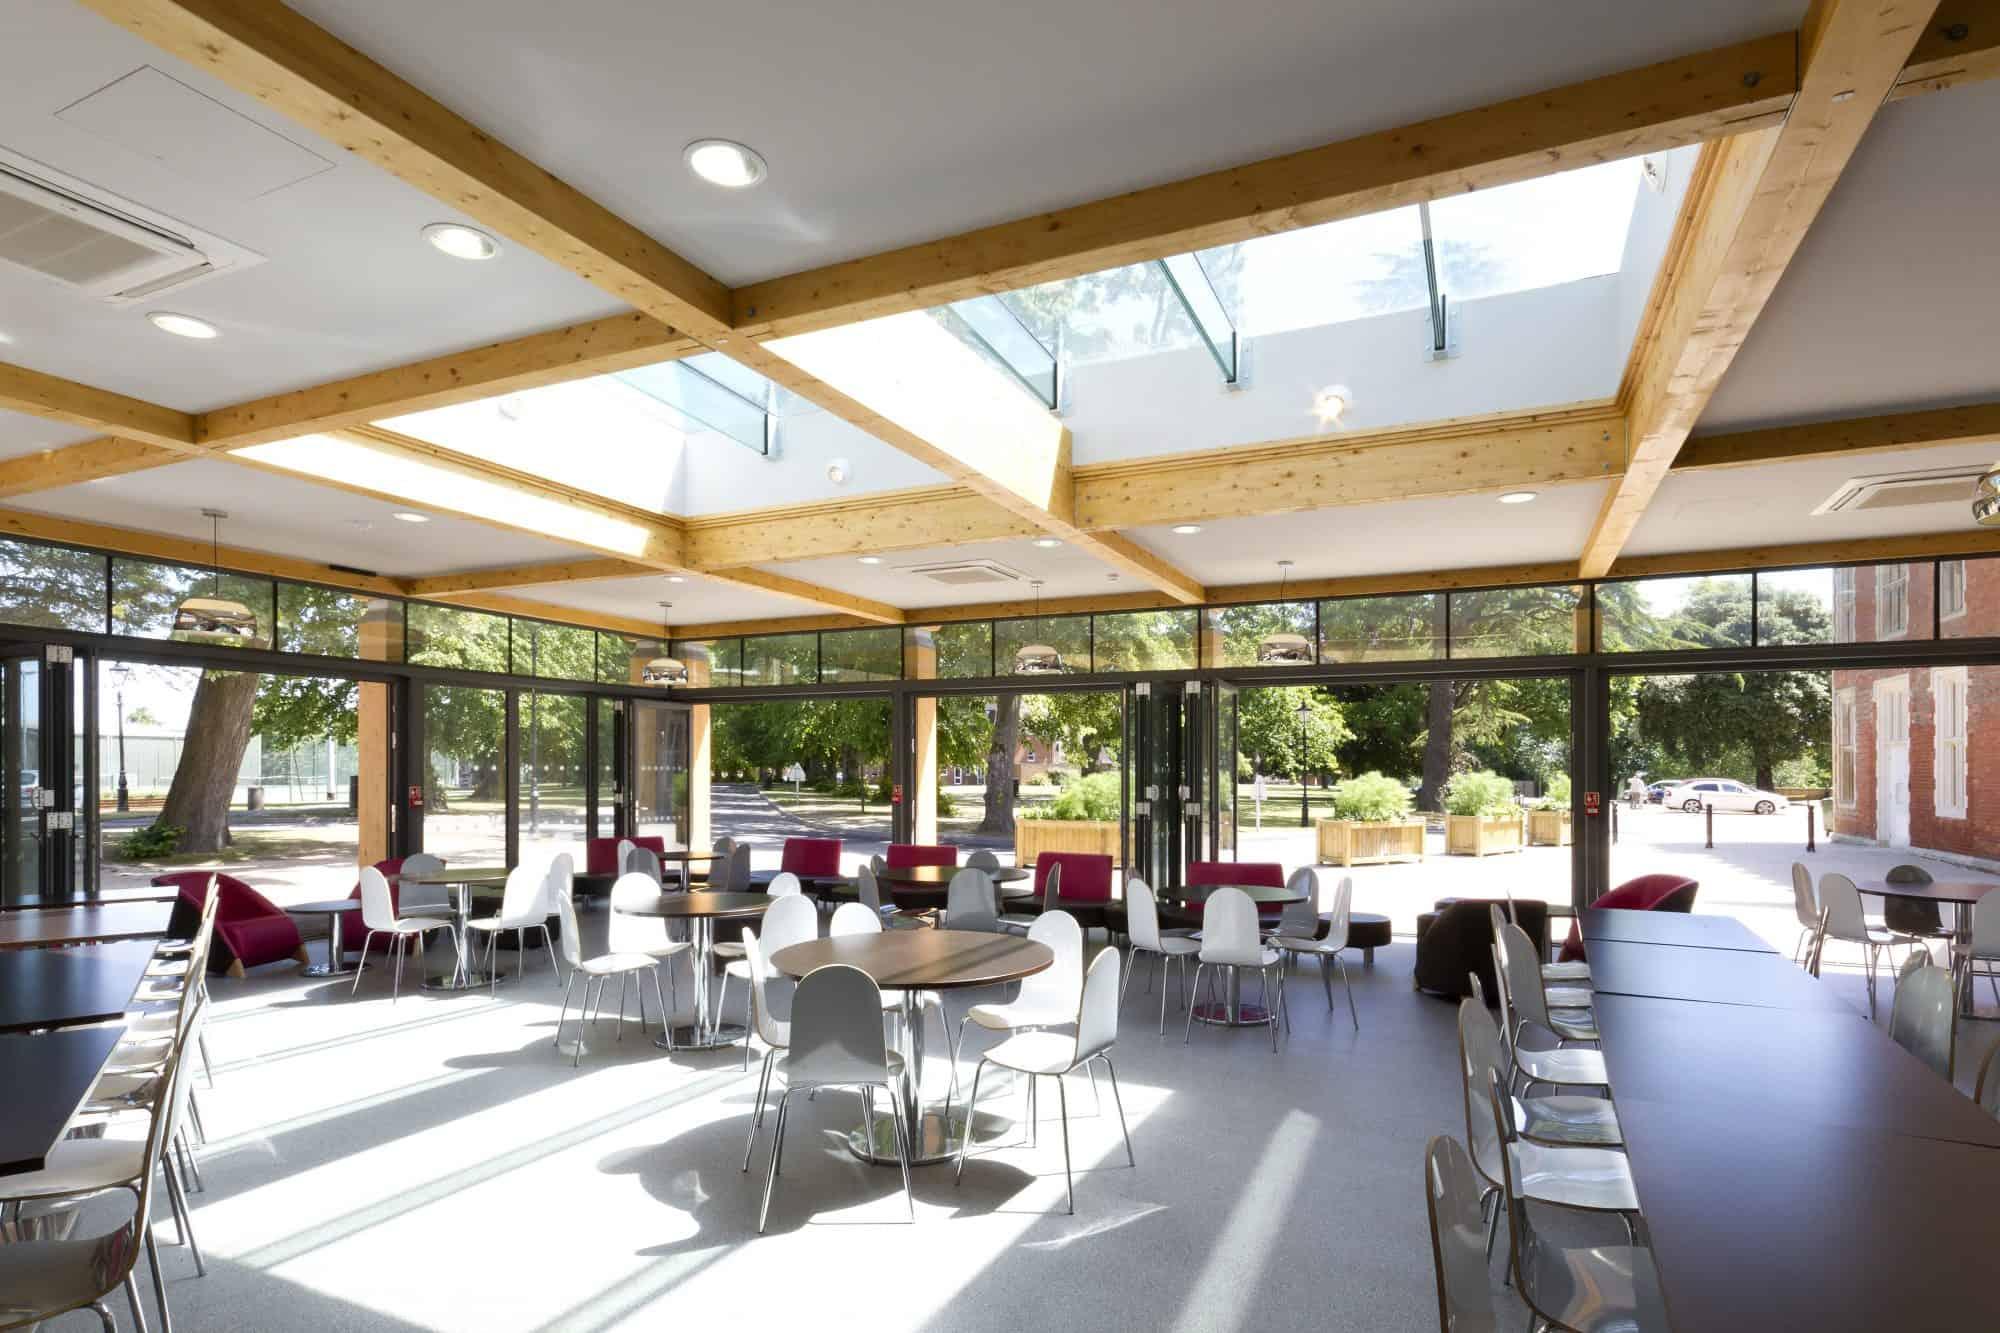 Benenden School Dining Hall Lee Evans Partnership